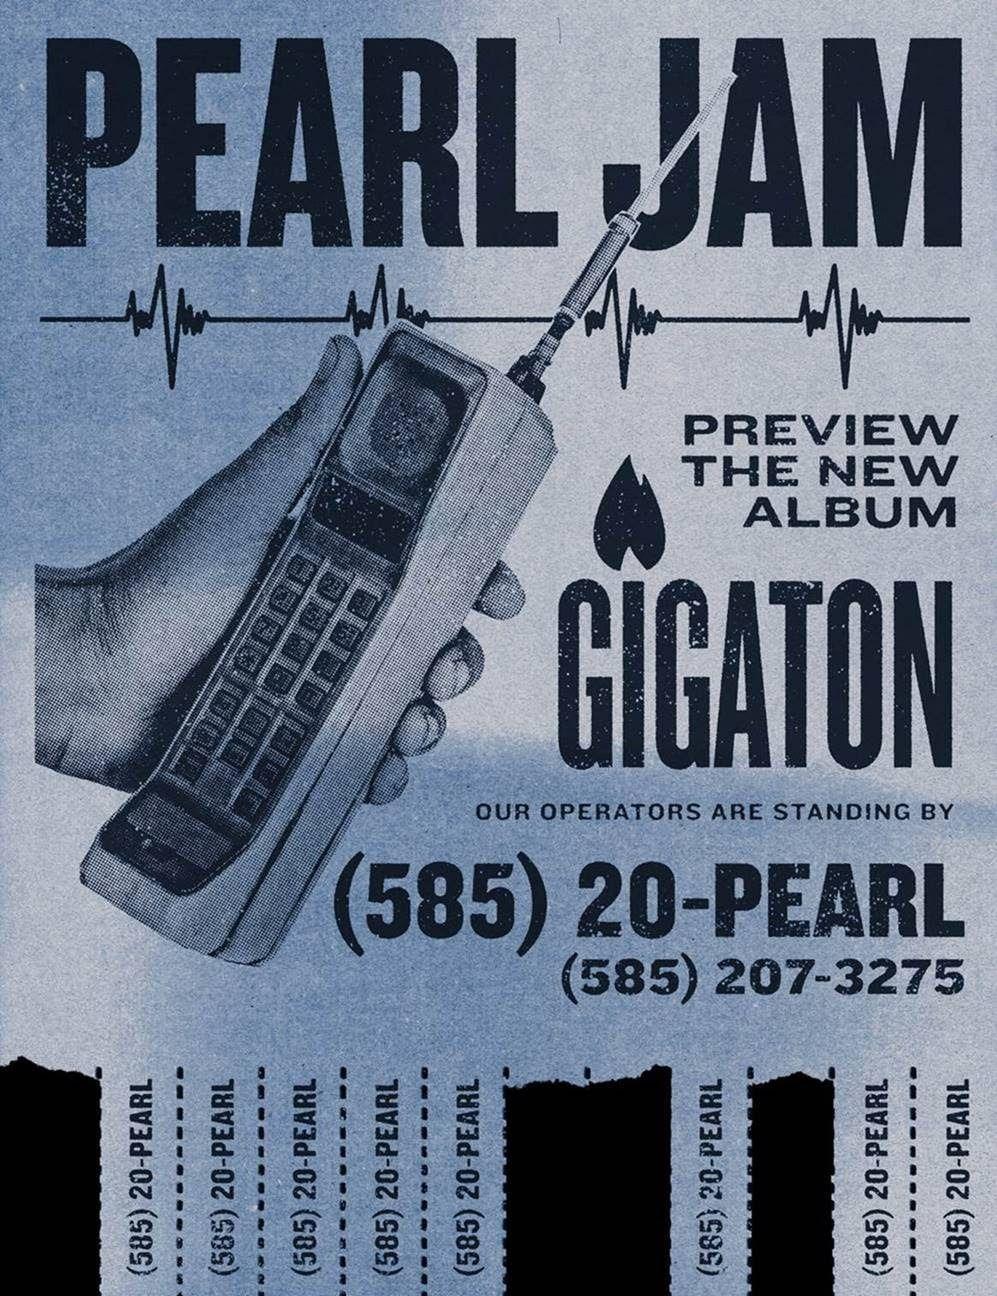 pearl-jam-gigaton-hotline